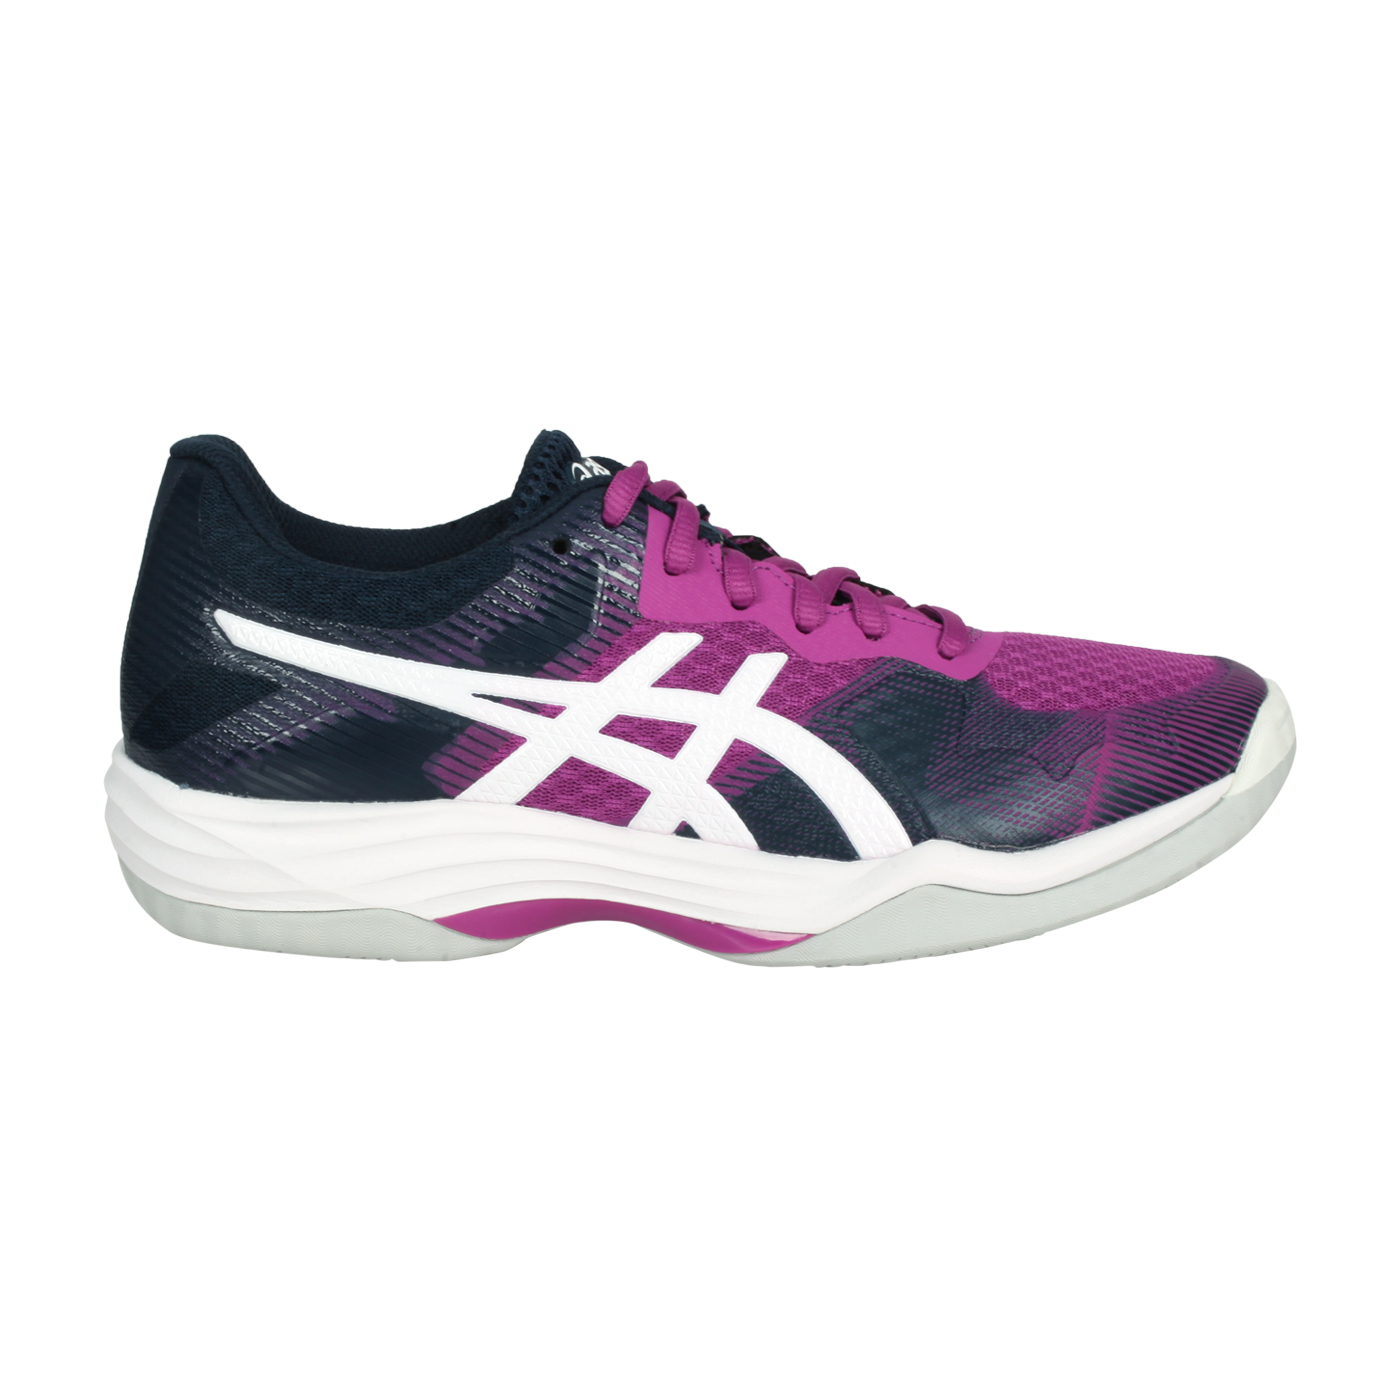 ASICS 女款排羽球鞋  @GEL-TACTIC@1072A035-501 - 紫白丈青